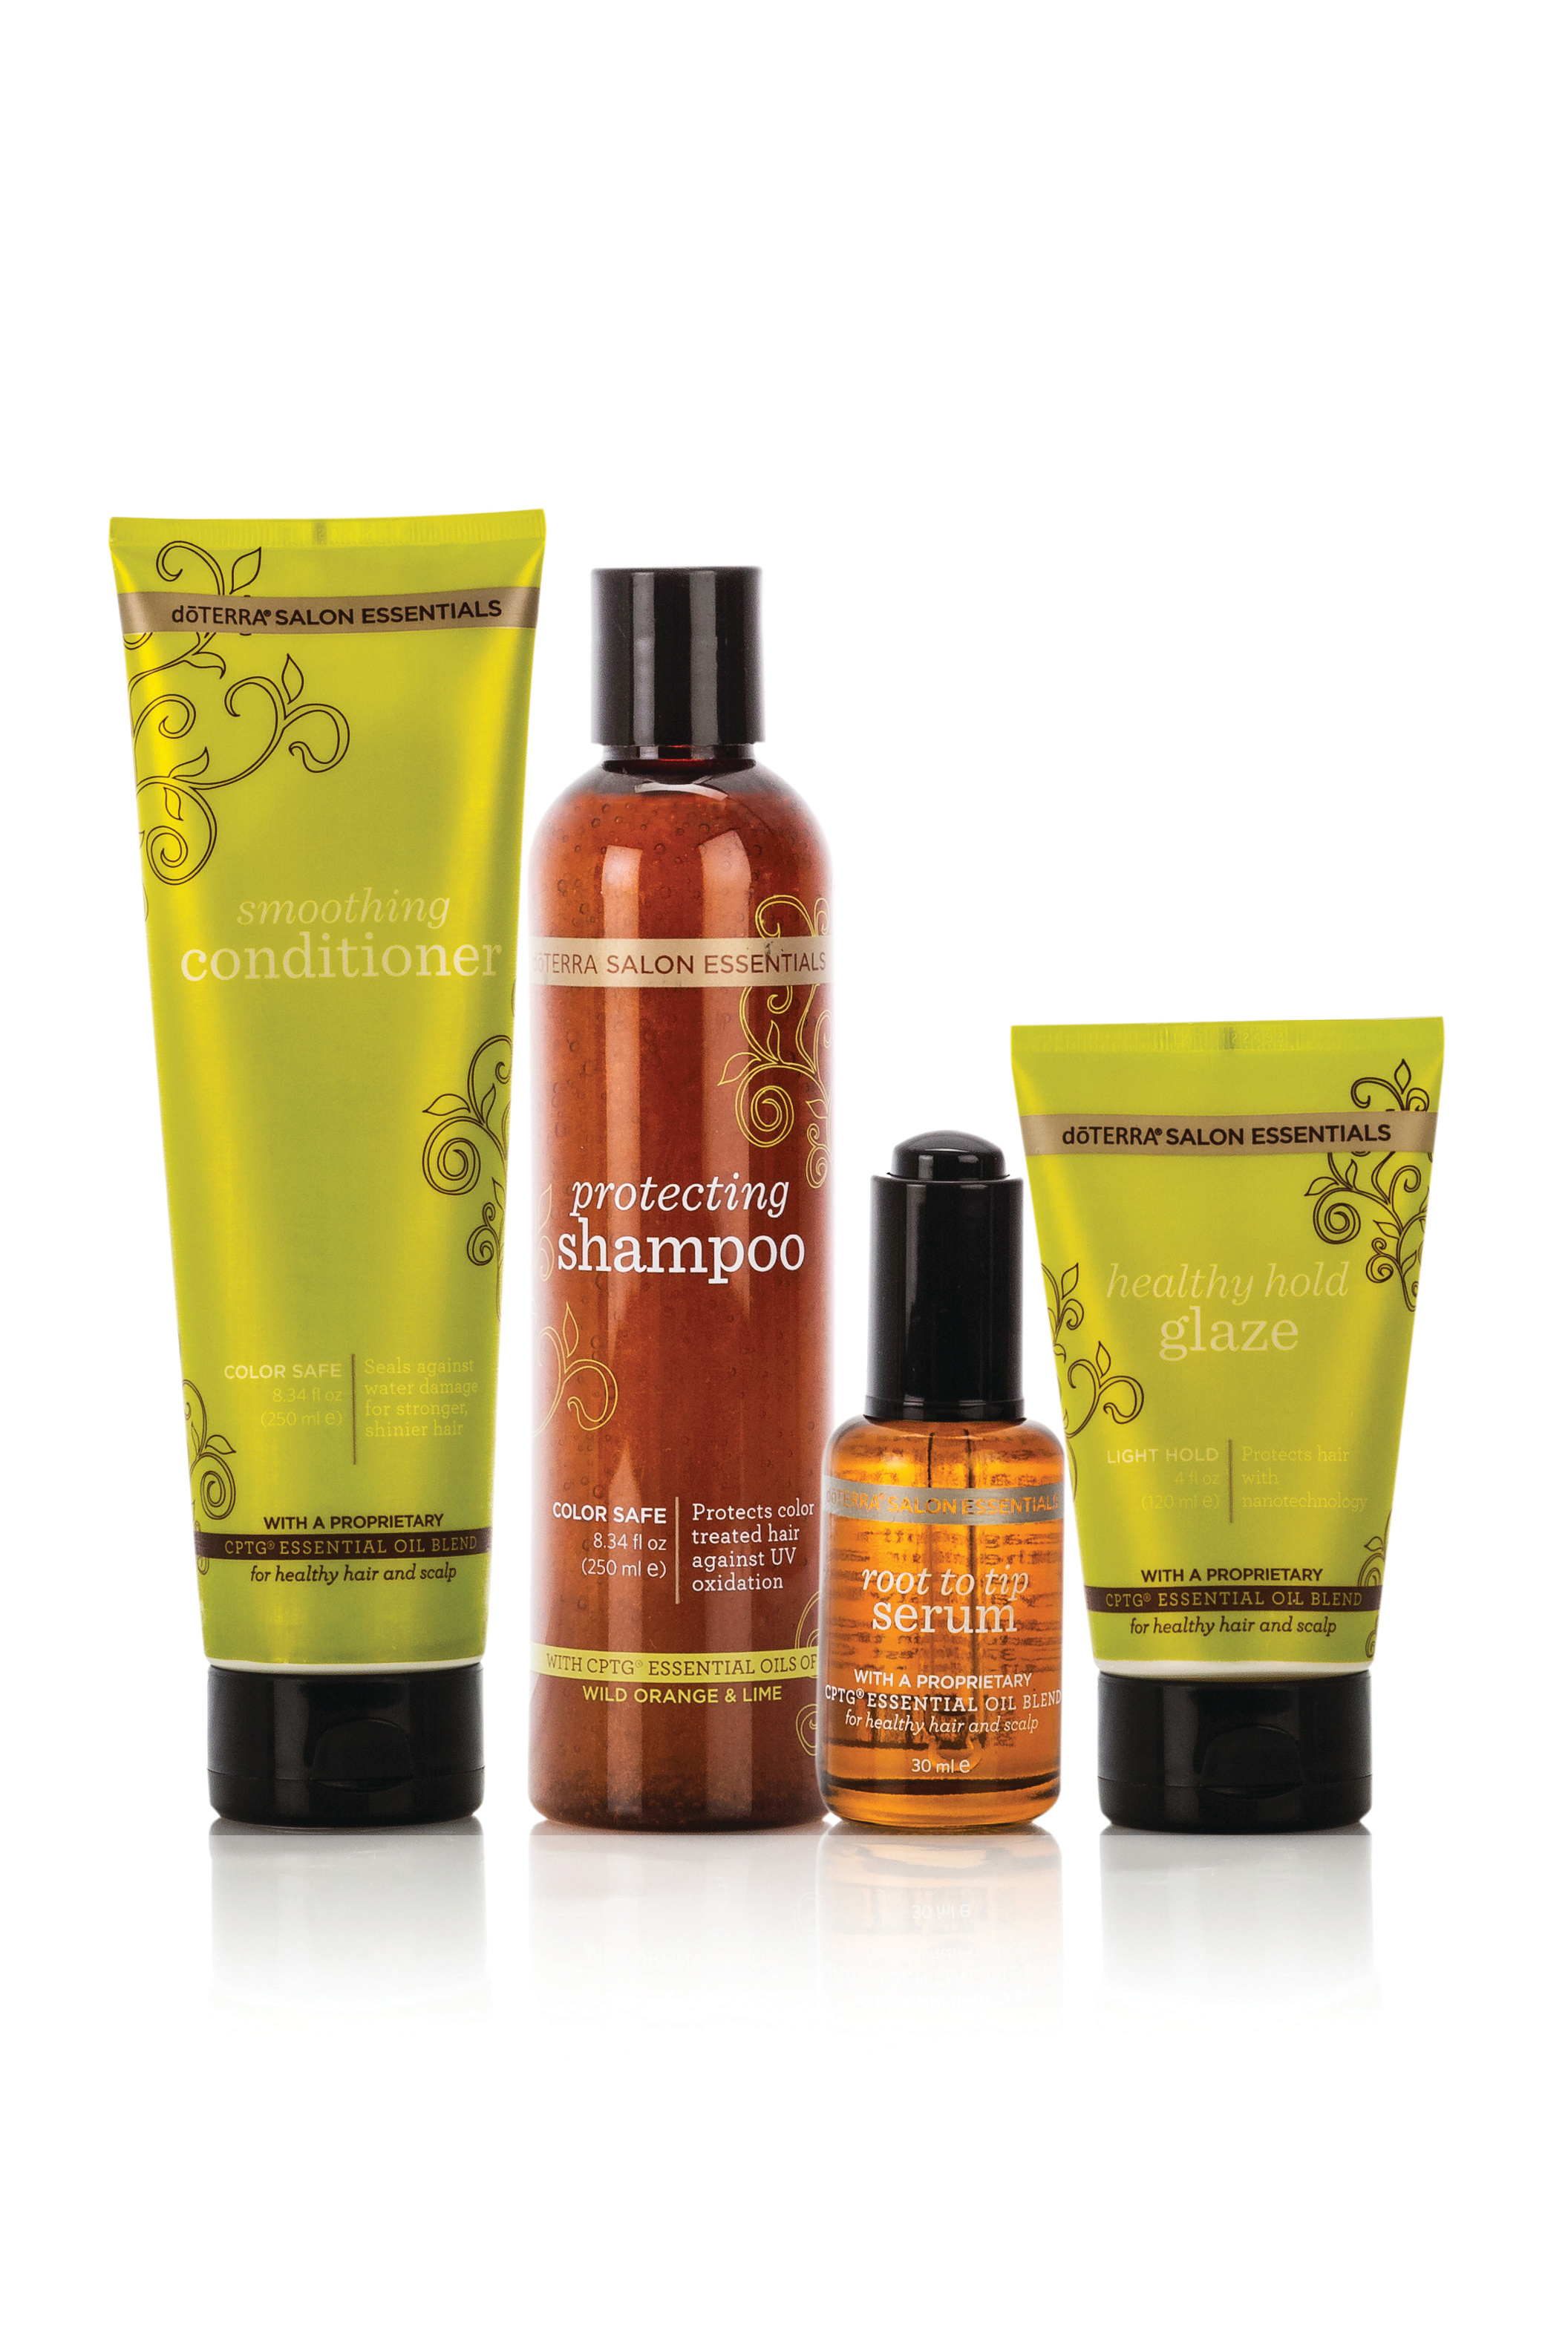 doterra-salon-essentials-hair-care-system[1]